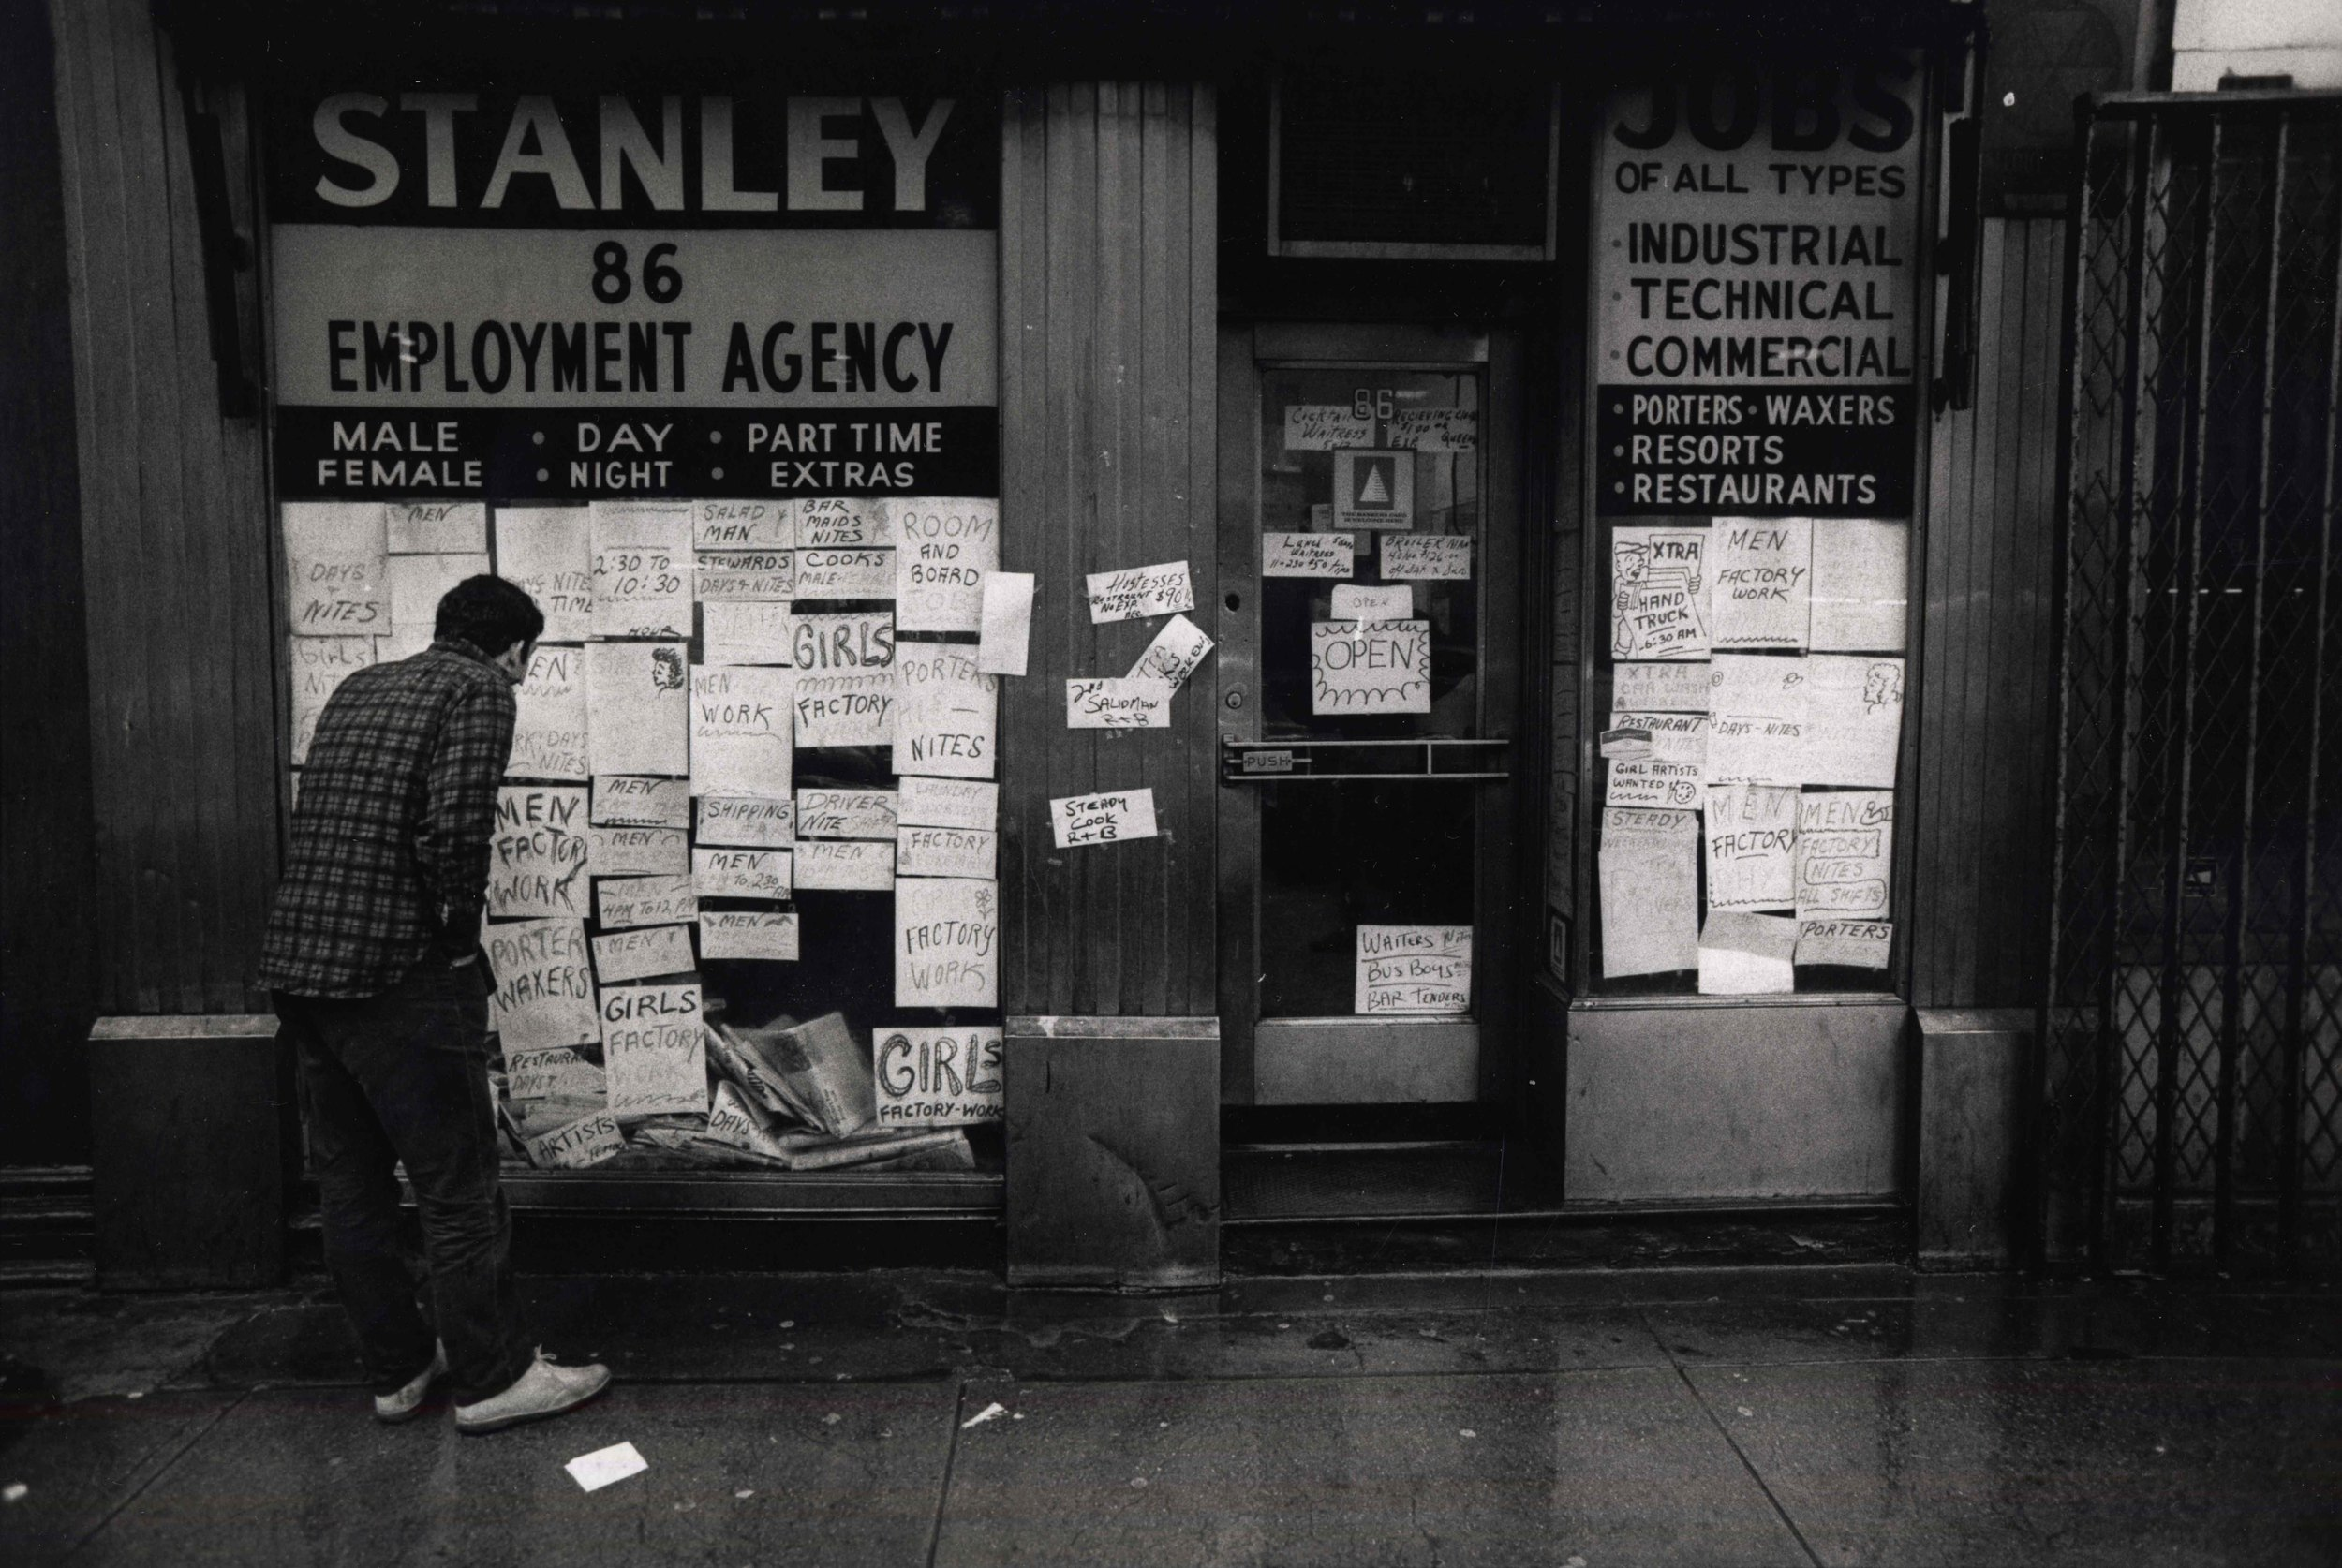 15_105_Stanley employment agency_Dan Wynn Archive.jpeg